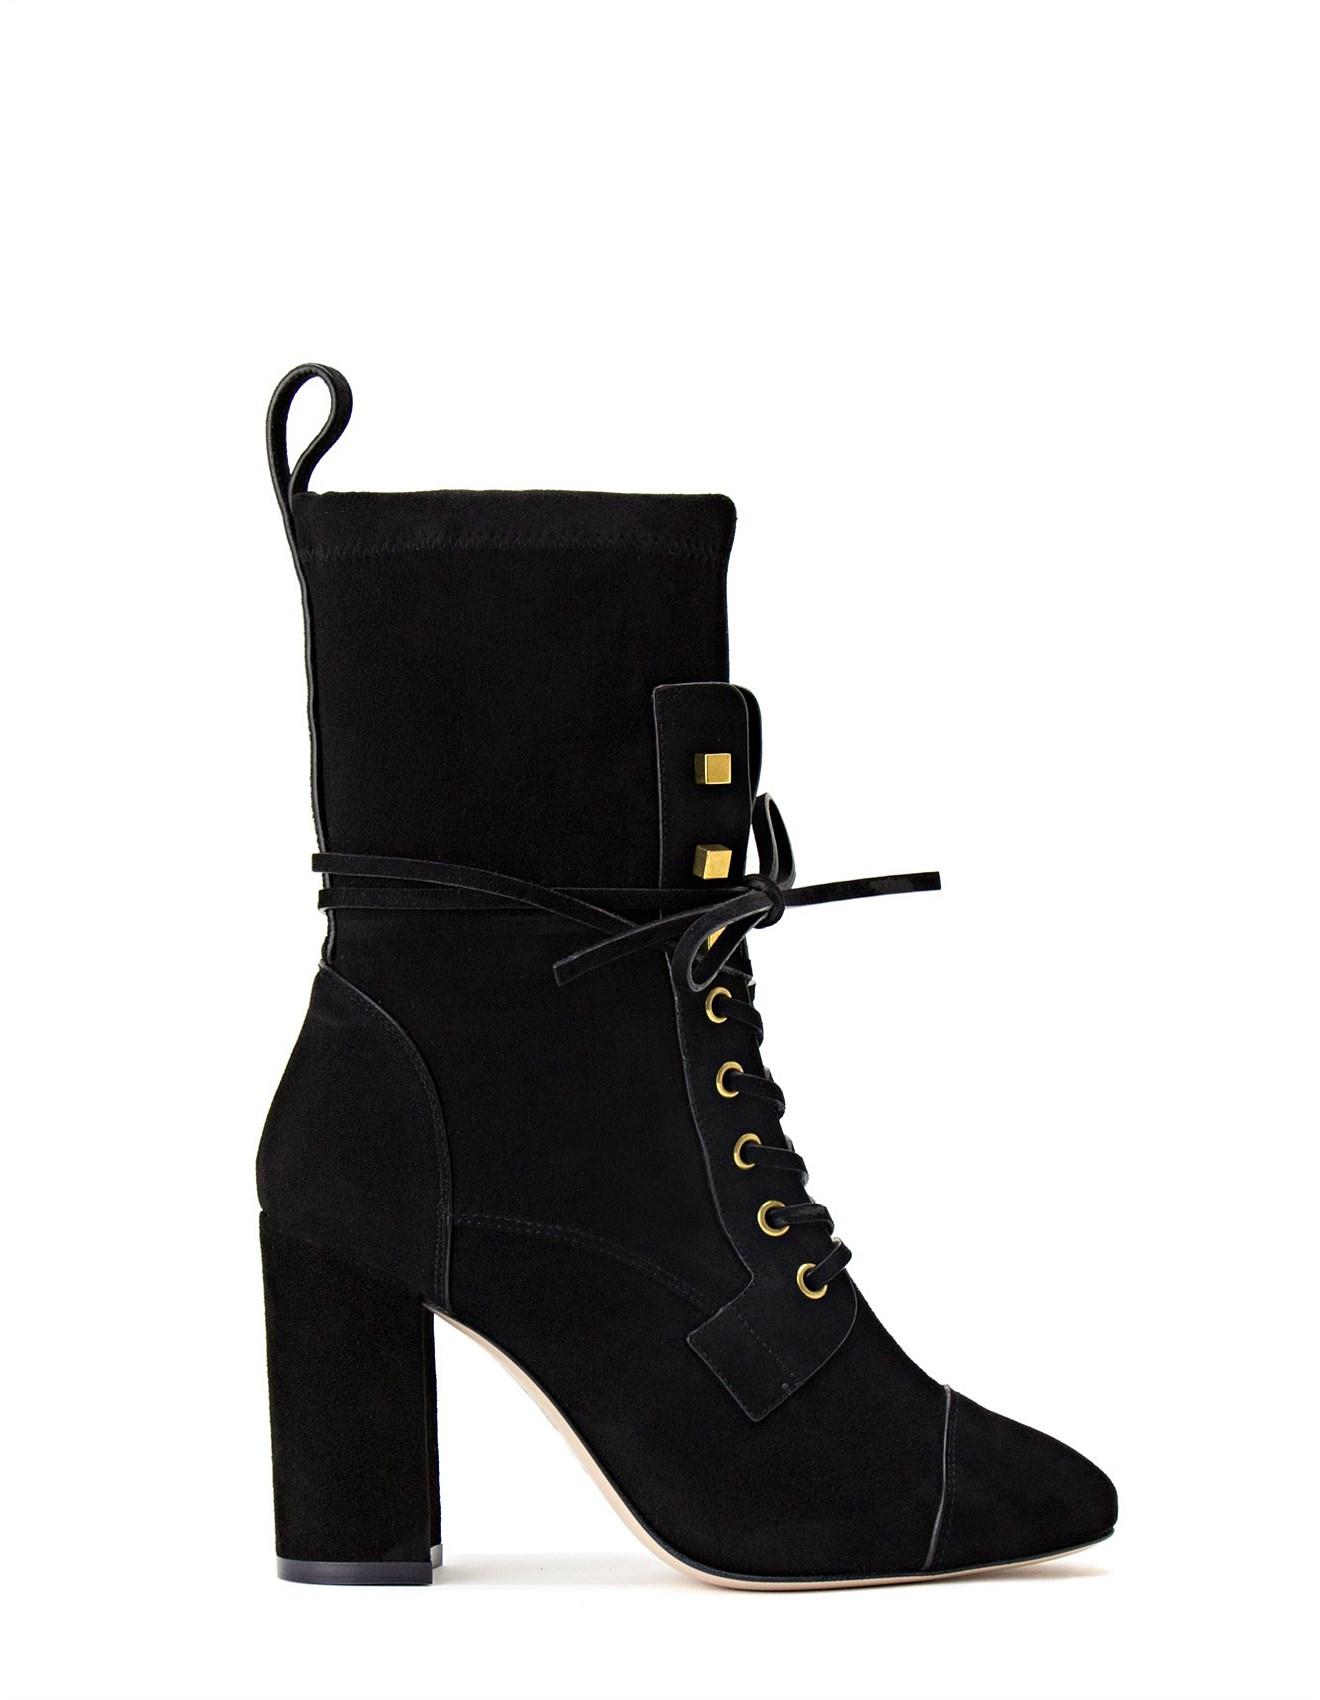 5a20d520d26 Women's Boots | Buy Ladies Boots Online Australia | David Jones - VERUKA  LACE UP BOOT